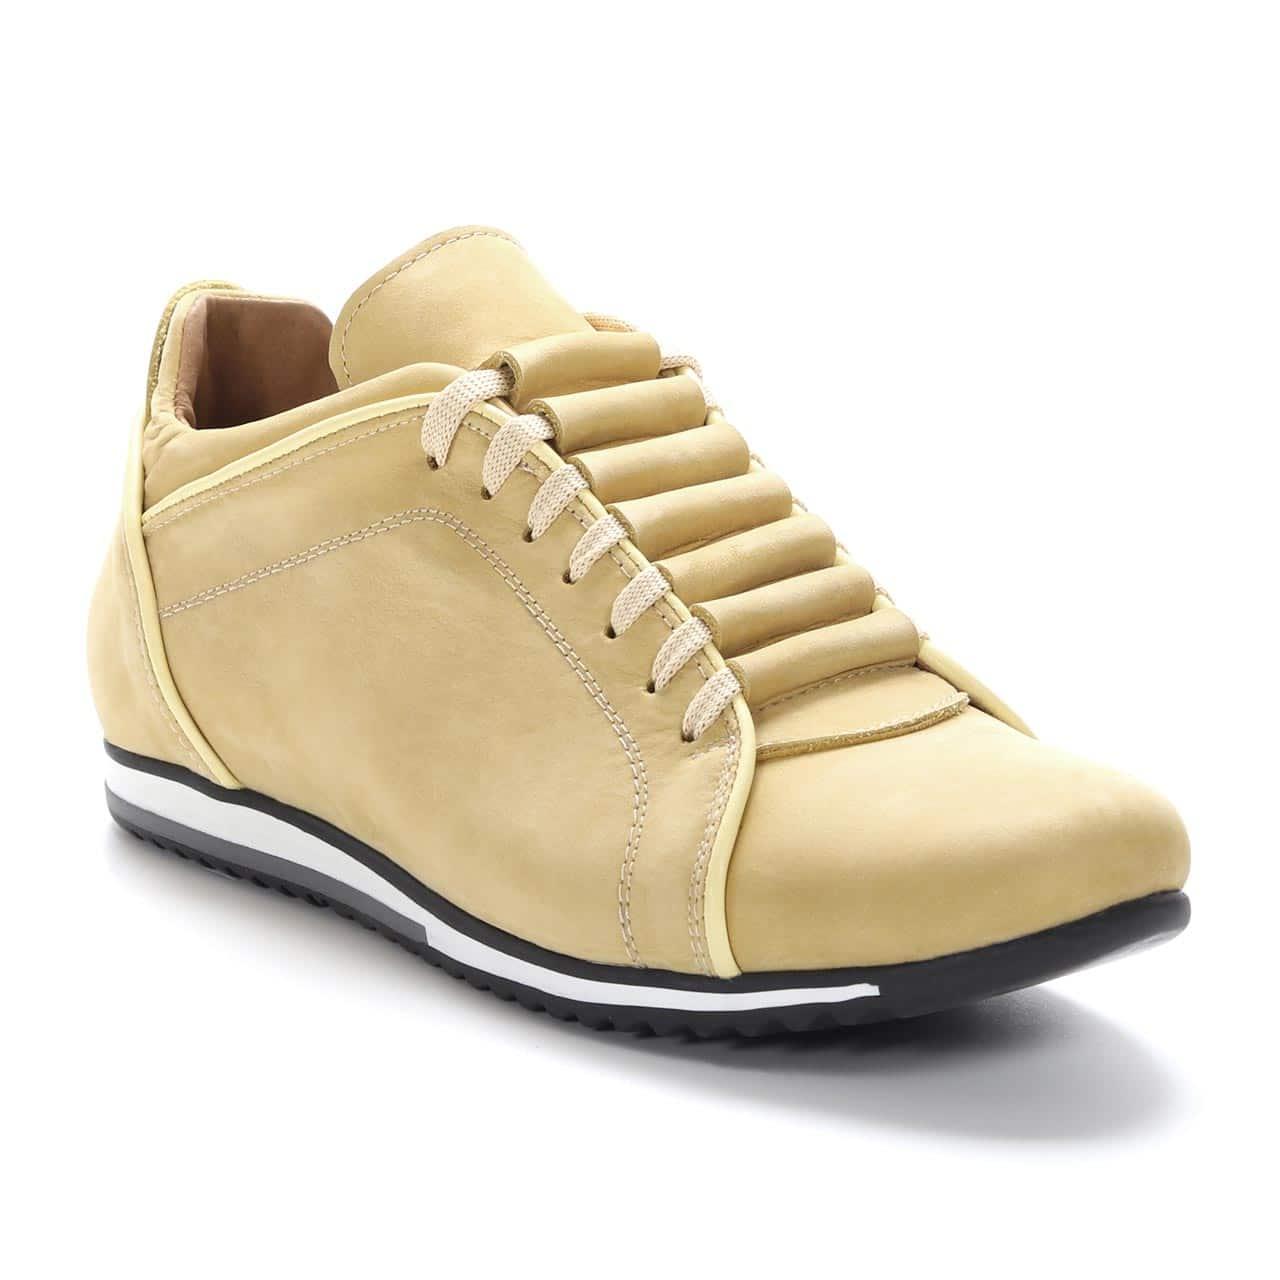 Kožna muška obuća - Muške cipele - Casual - 04-1 - Žuta